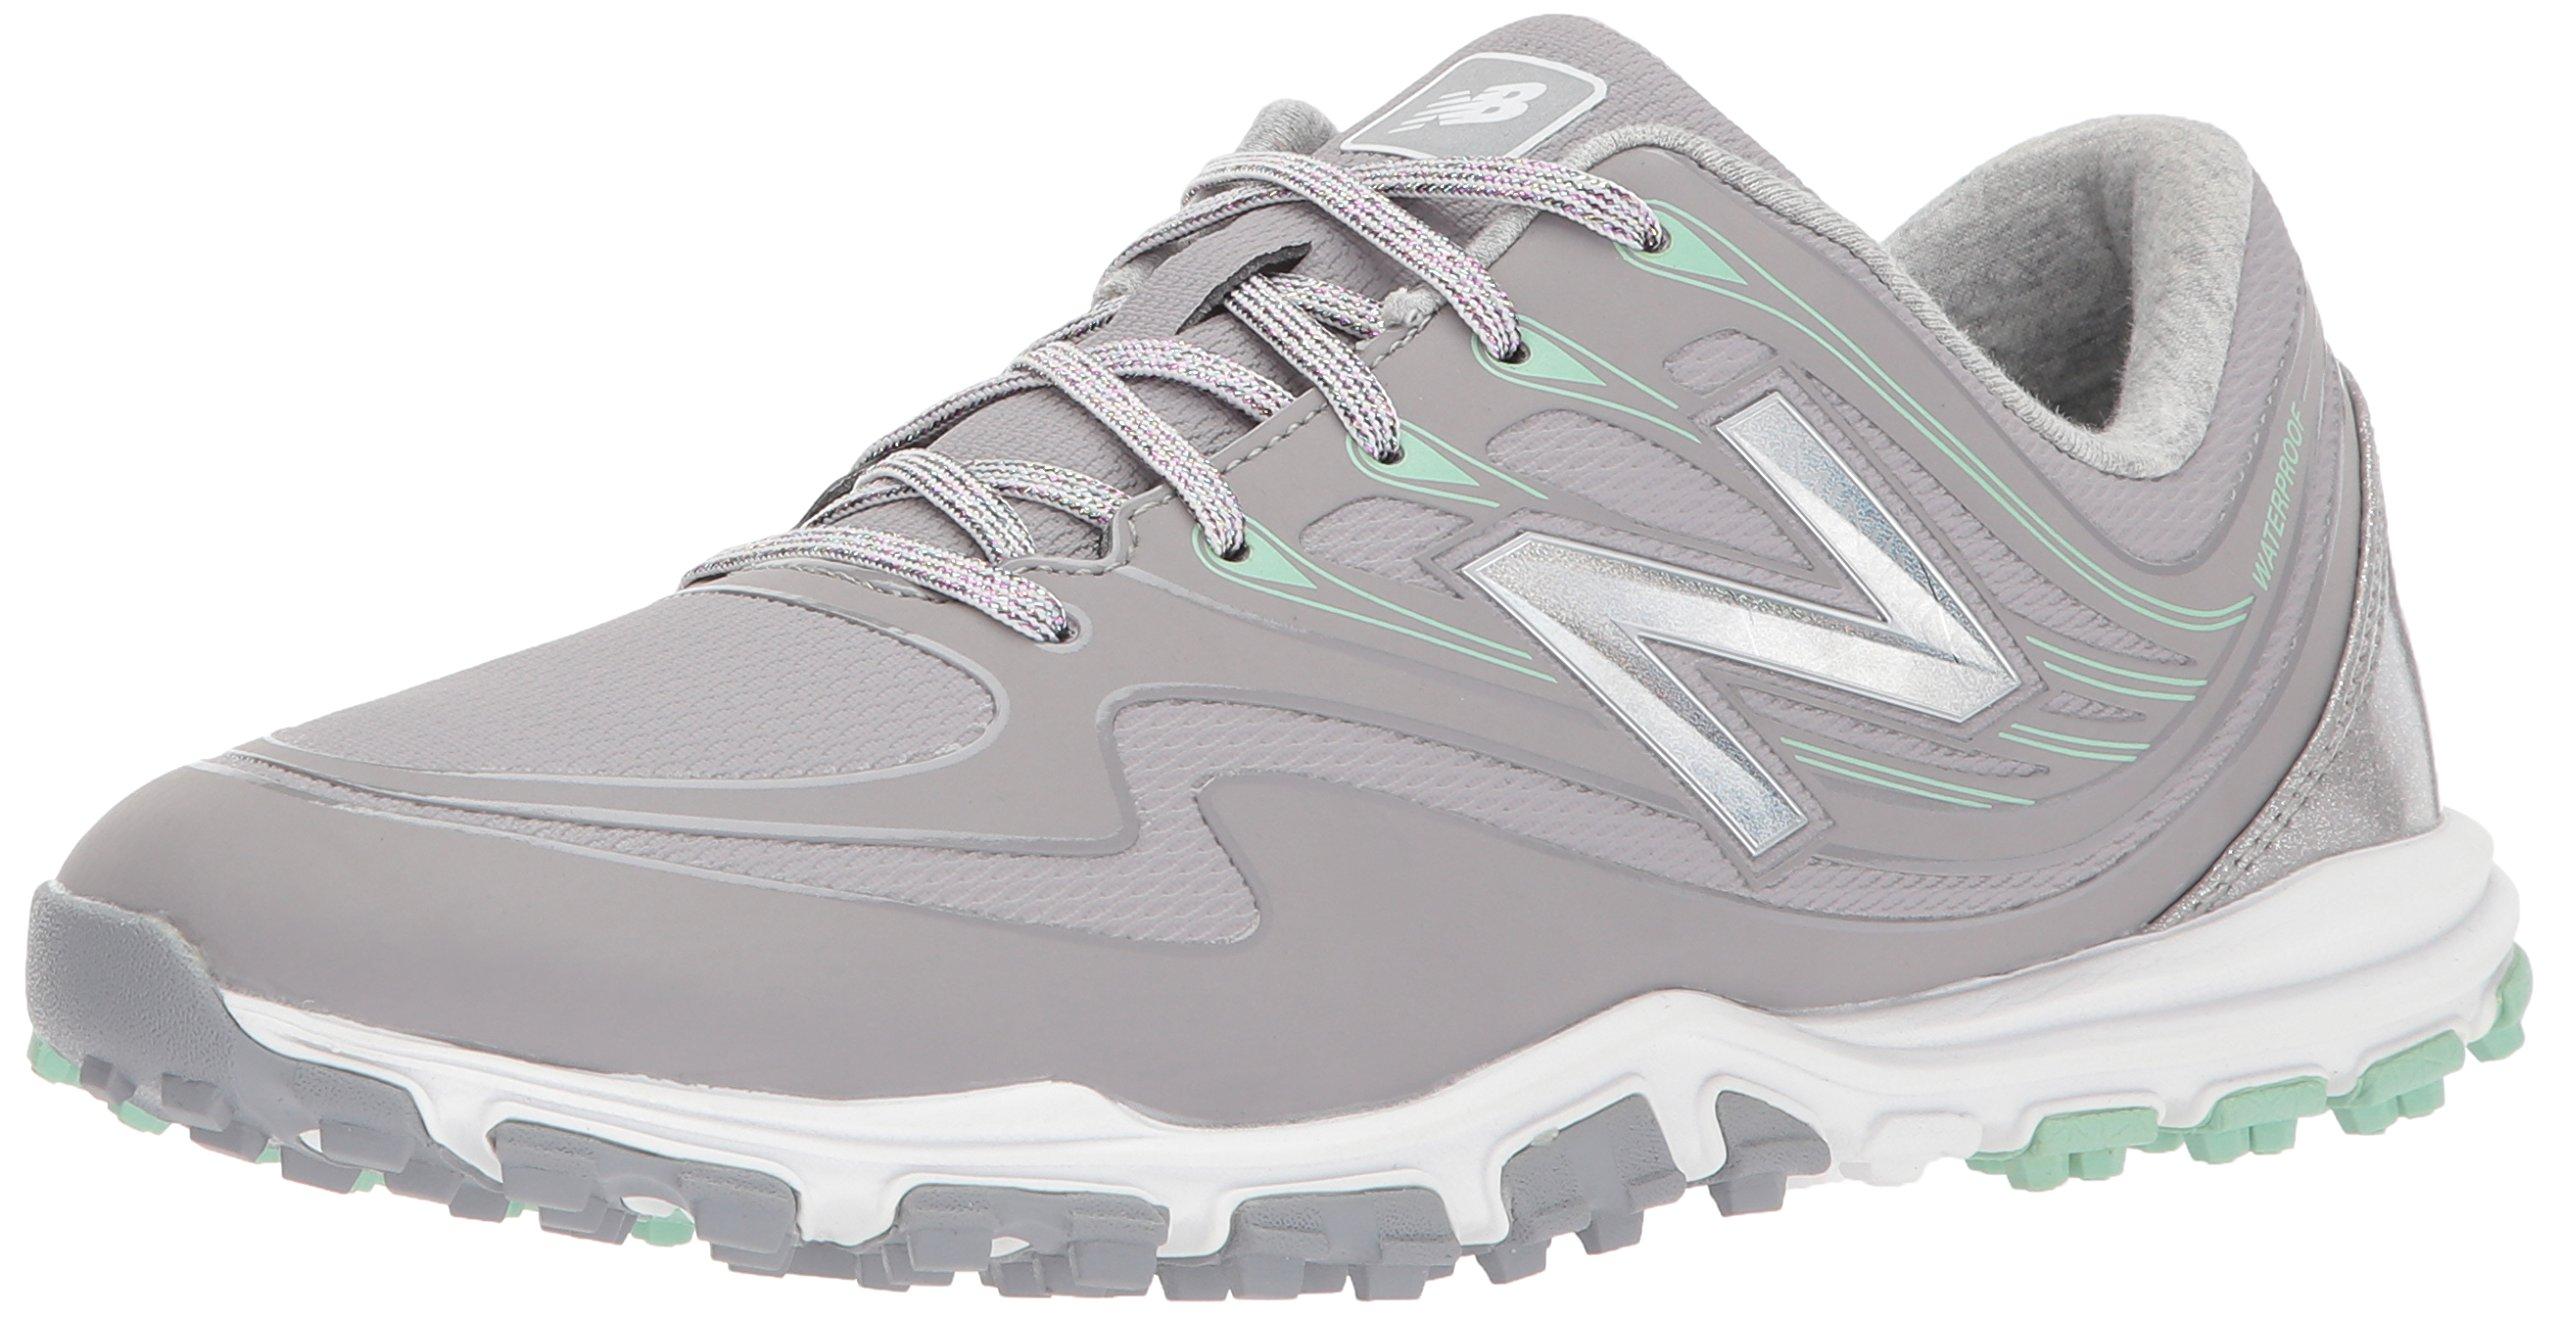 New Balance Women's Minimus WP Waterproof Spikeless Comfort Golf Shoe, Grey/Mint, 6 W